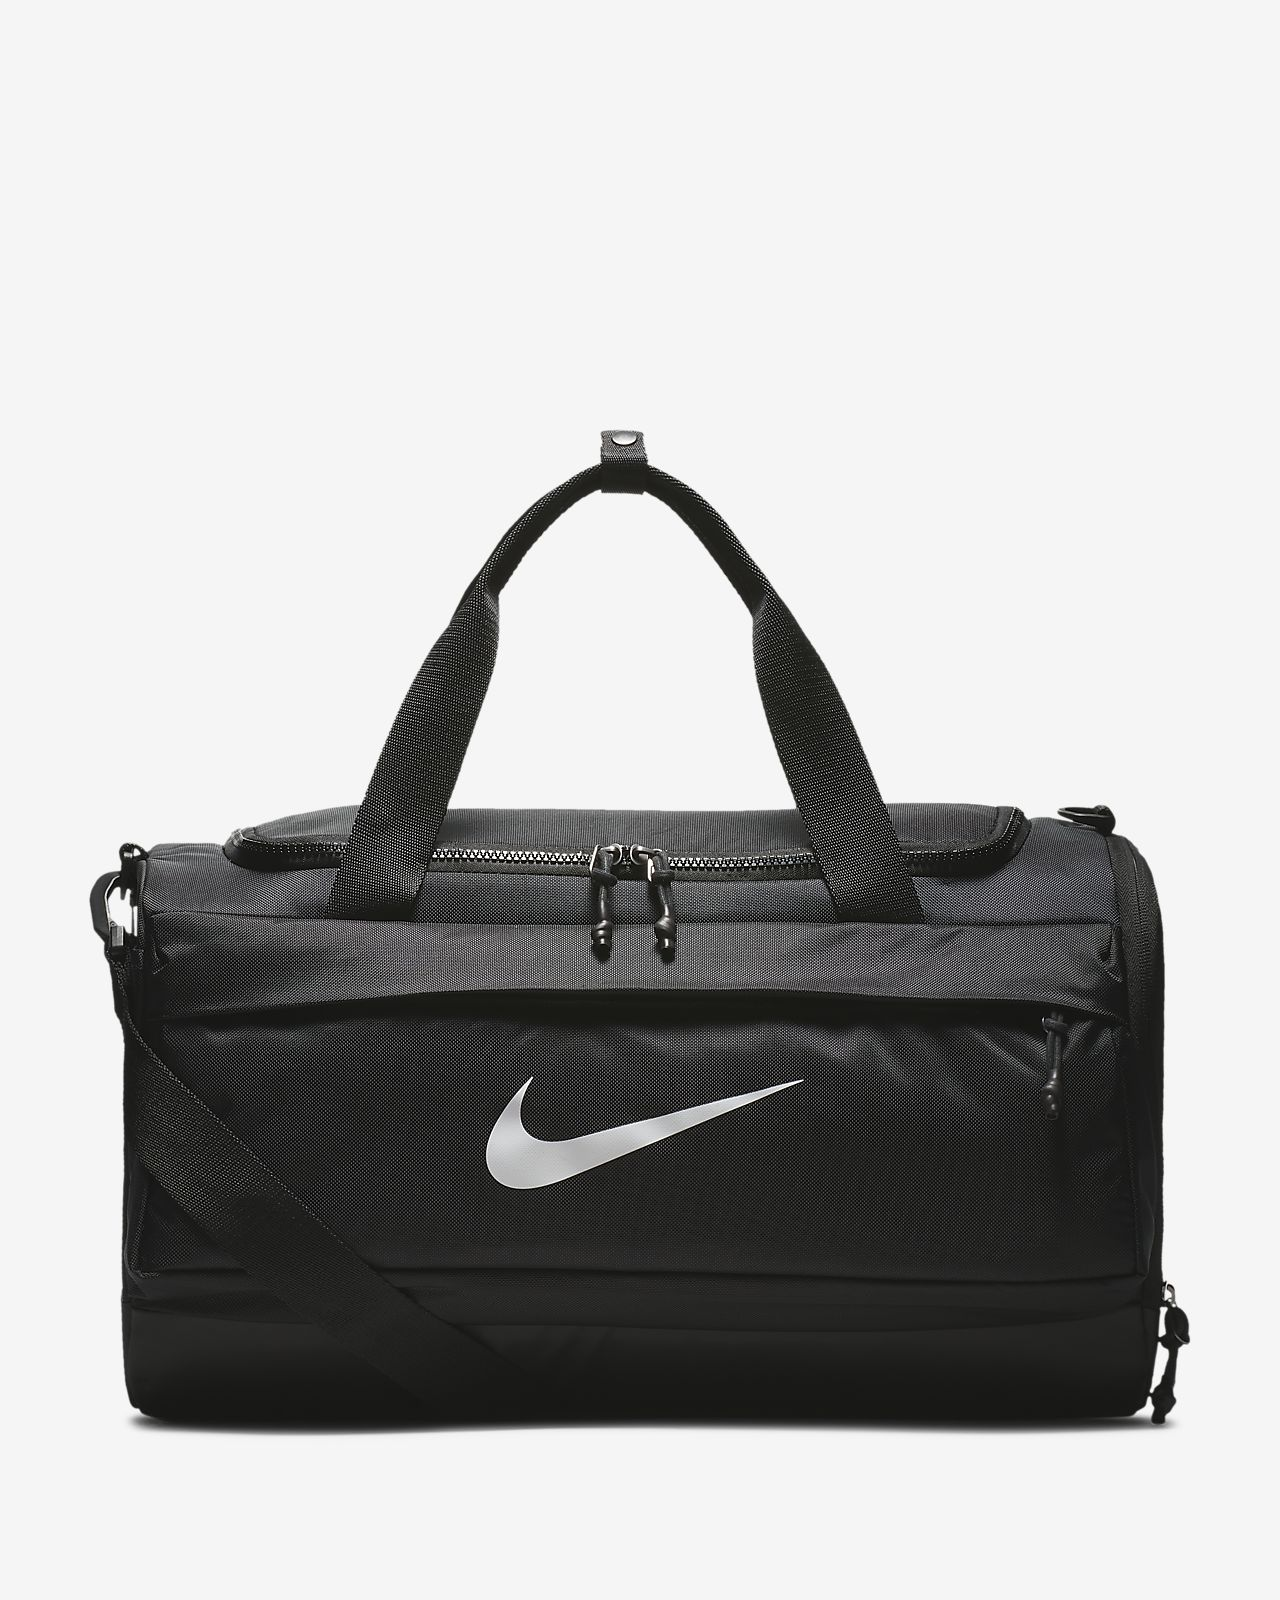 9d73e19b5 Nike Vapor Sprint Kids' Duffel Bag. Nike.com